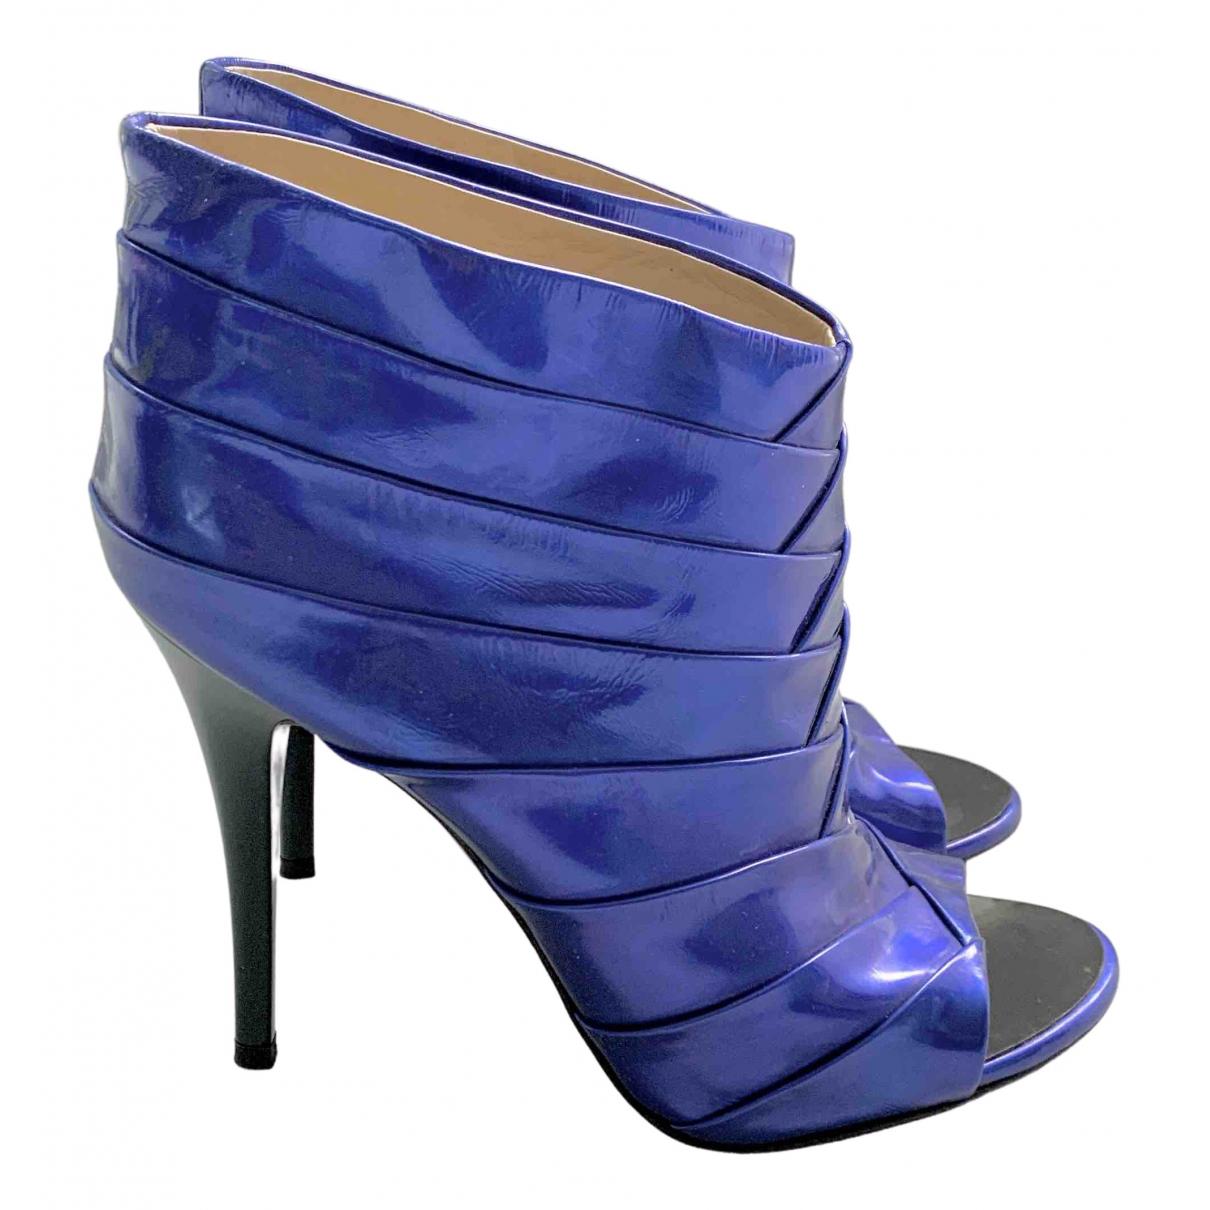 Giuseppe Zanotti - Boots   pour femme en cuir verni - bleu